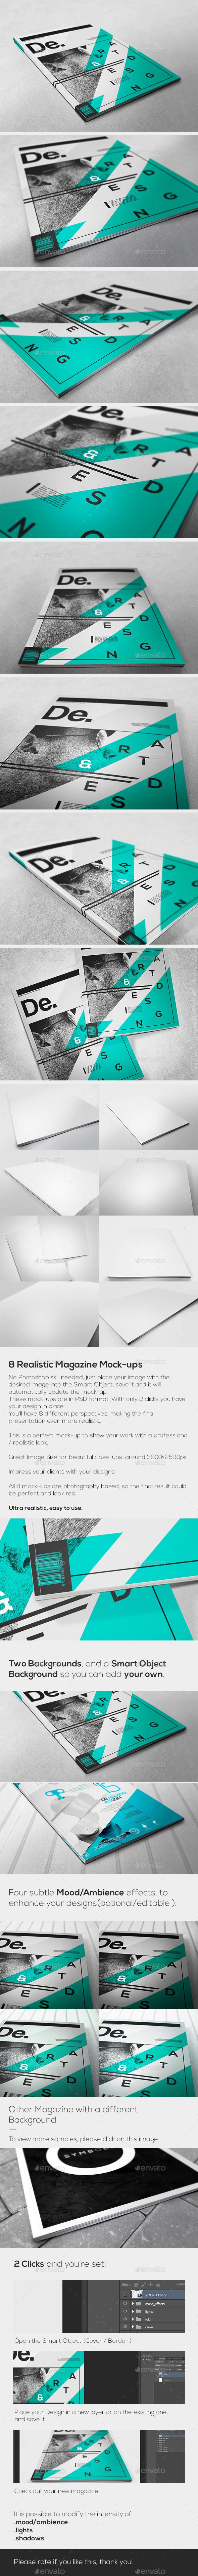 GraphicRiver Magazine Realistic Mock-ups 11280352